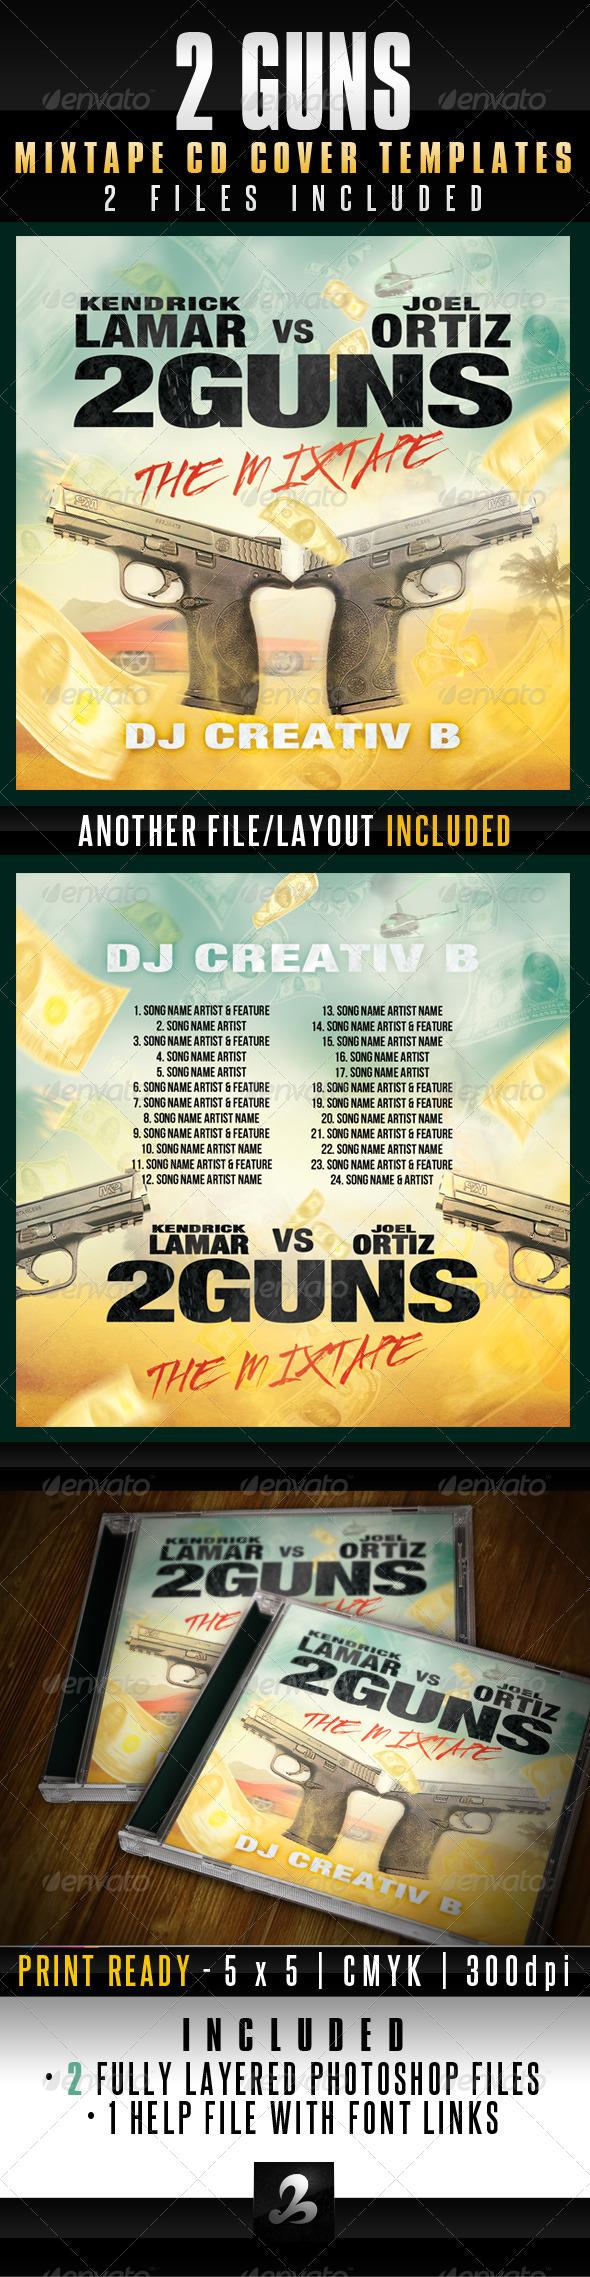 2 Guns Mixtape CD Cover Templates - CD & DVD Artwork Print Templates